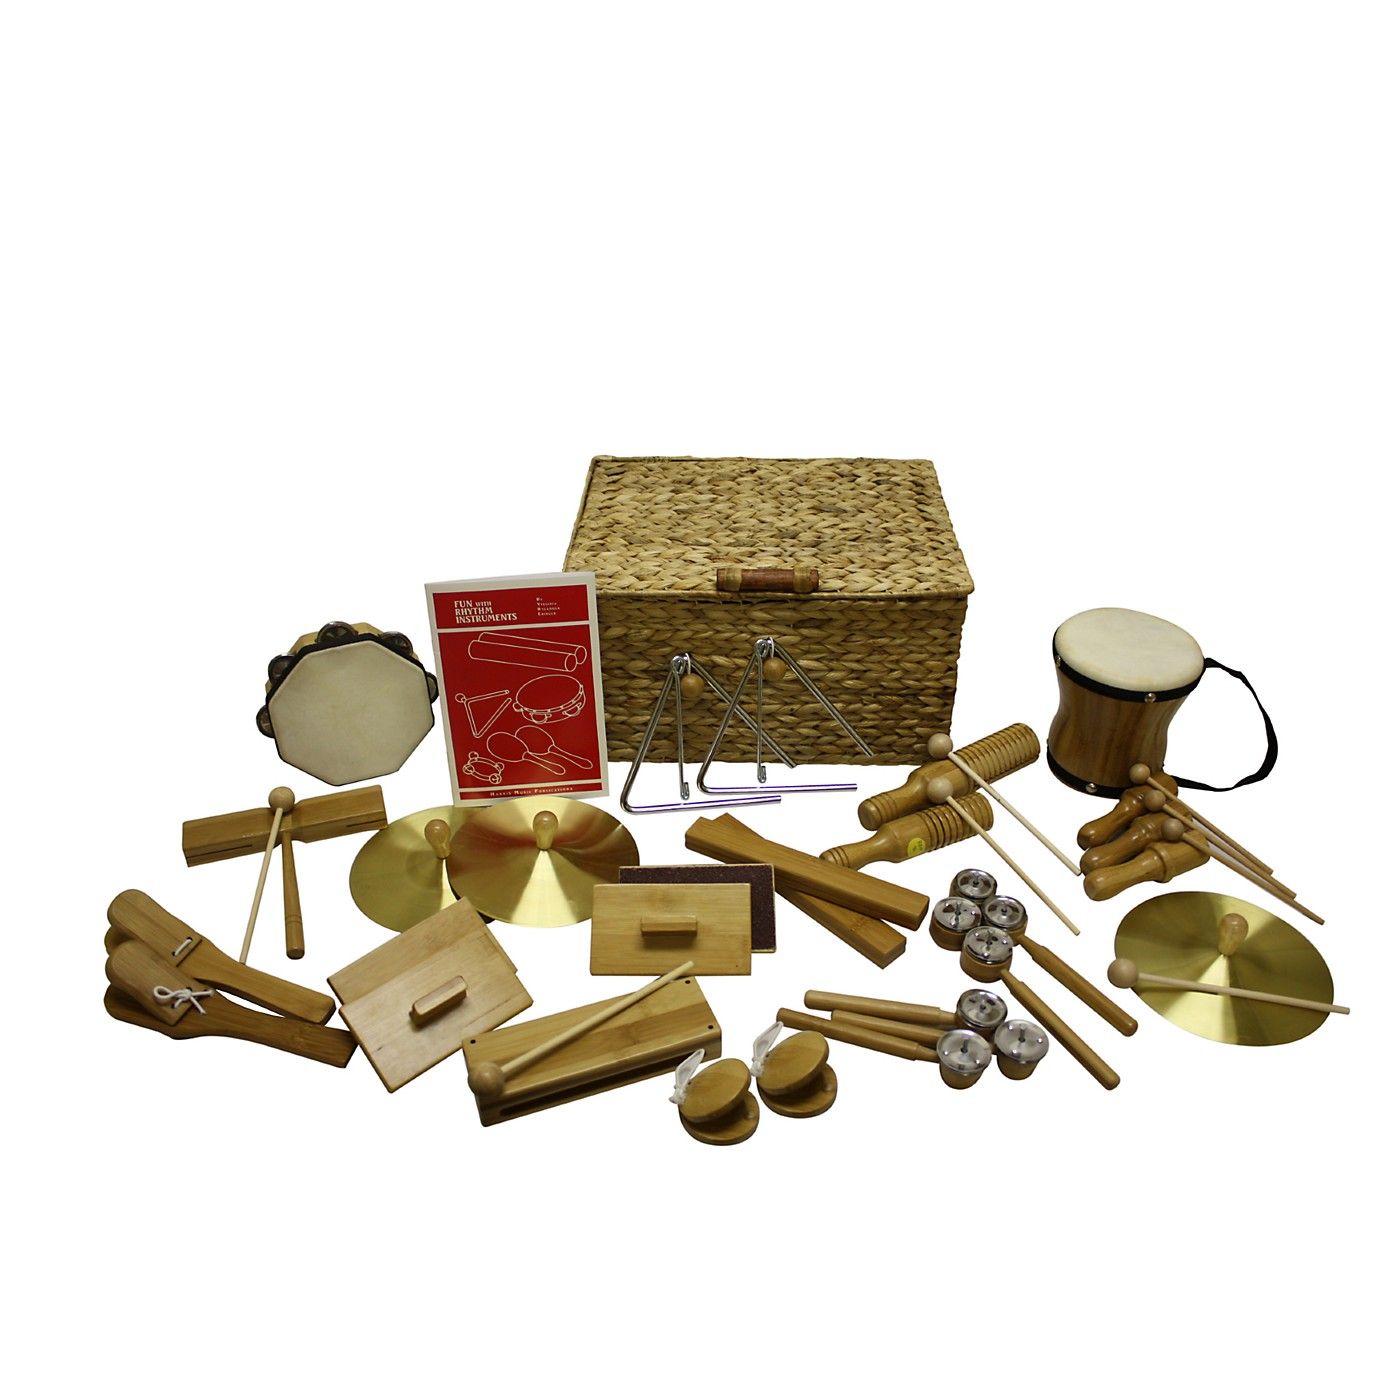 Rhythm Band Deluxe 25 Player Bamboo Rhythm Kit thumbnail